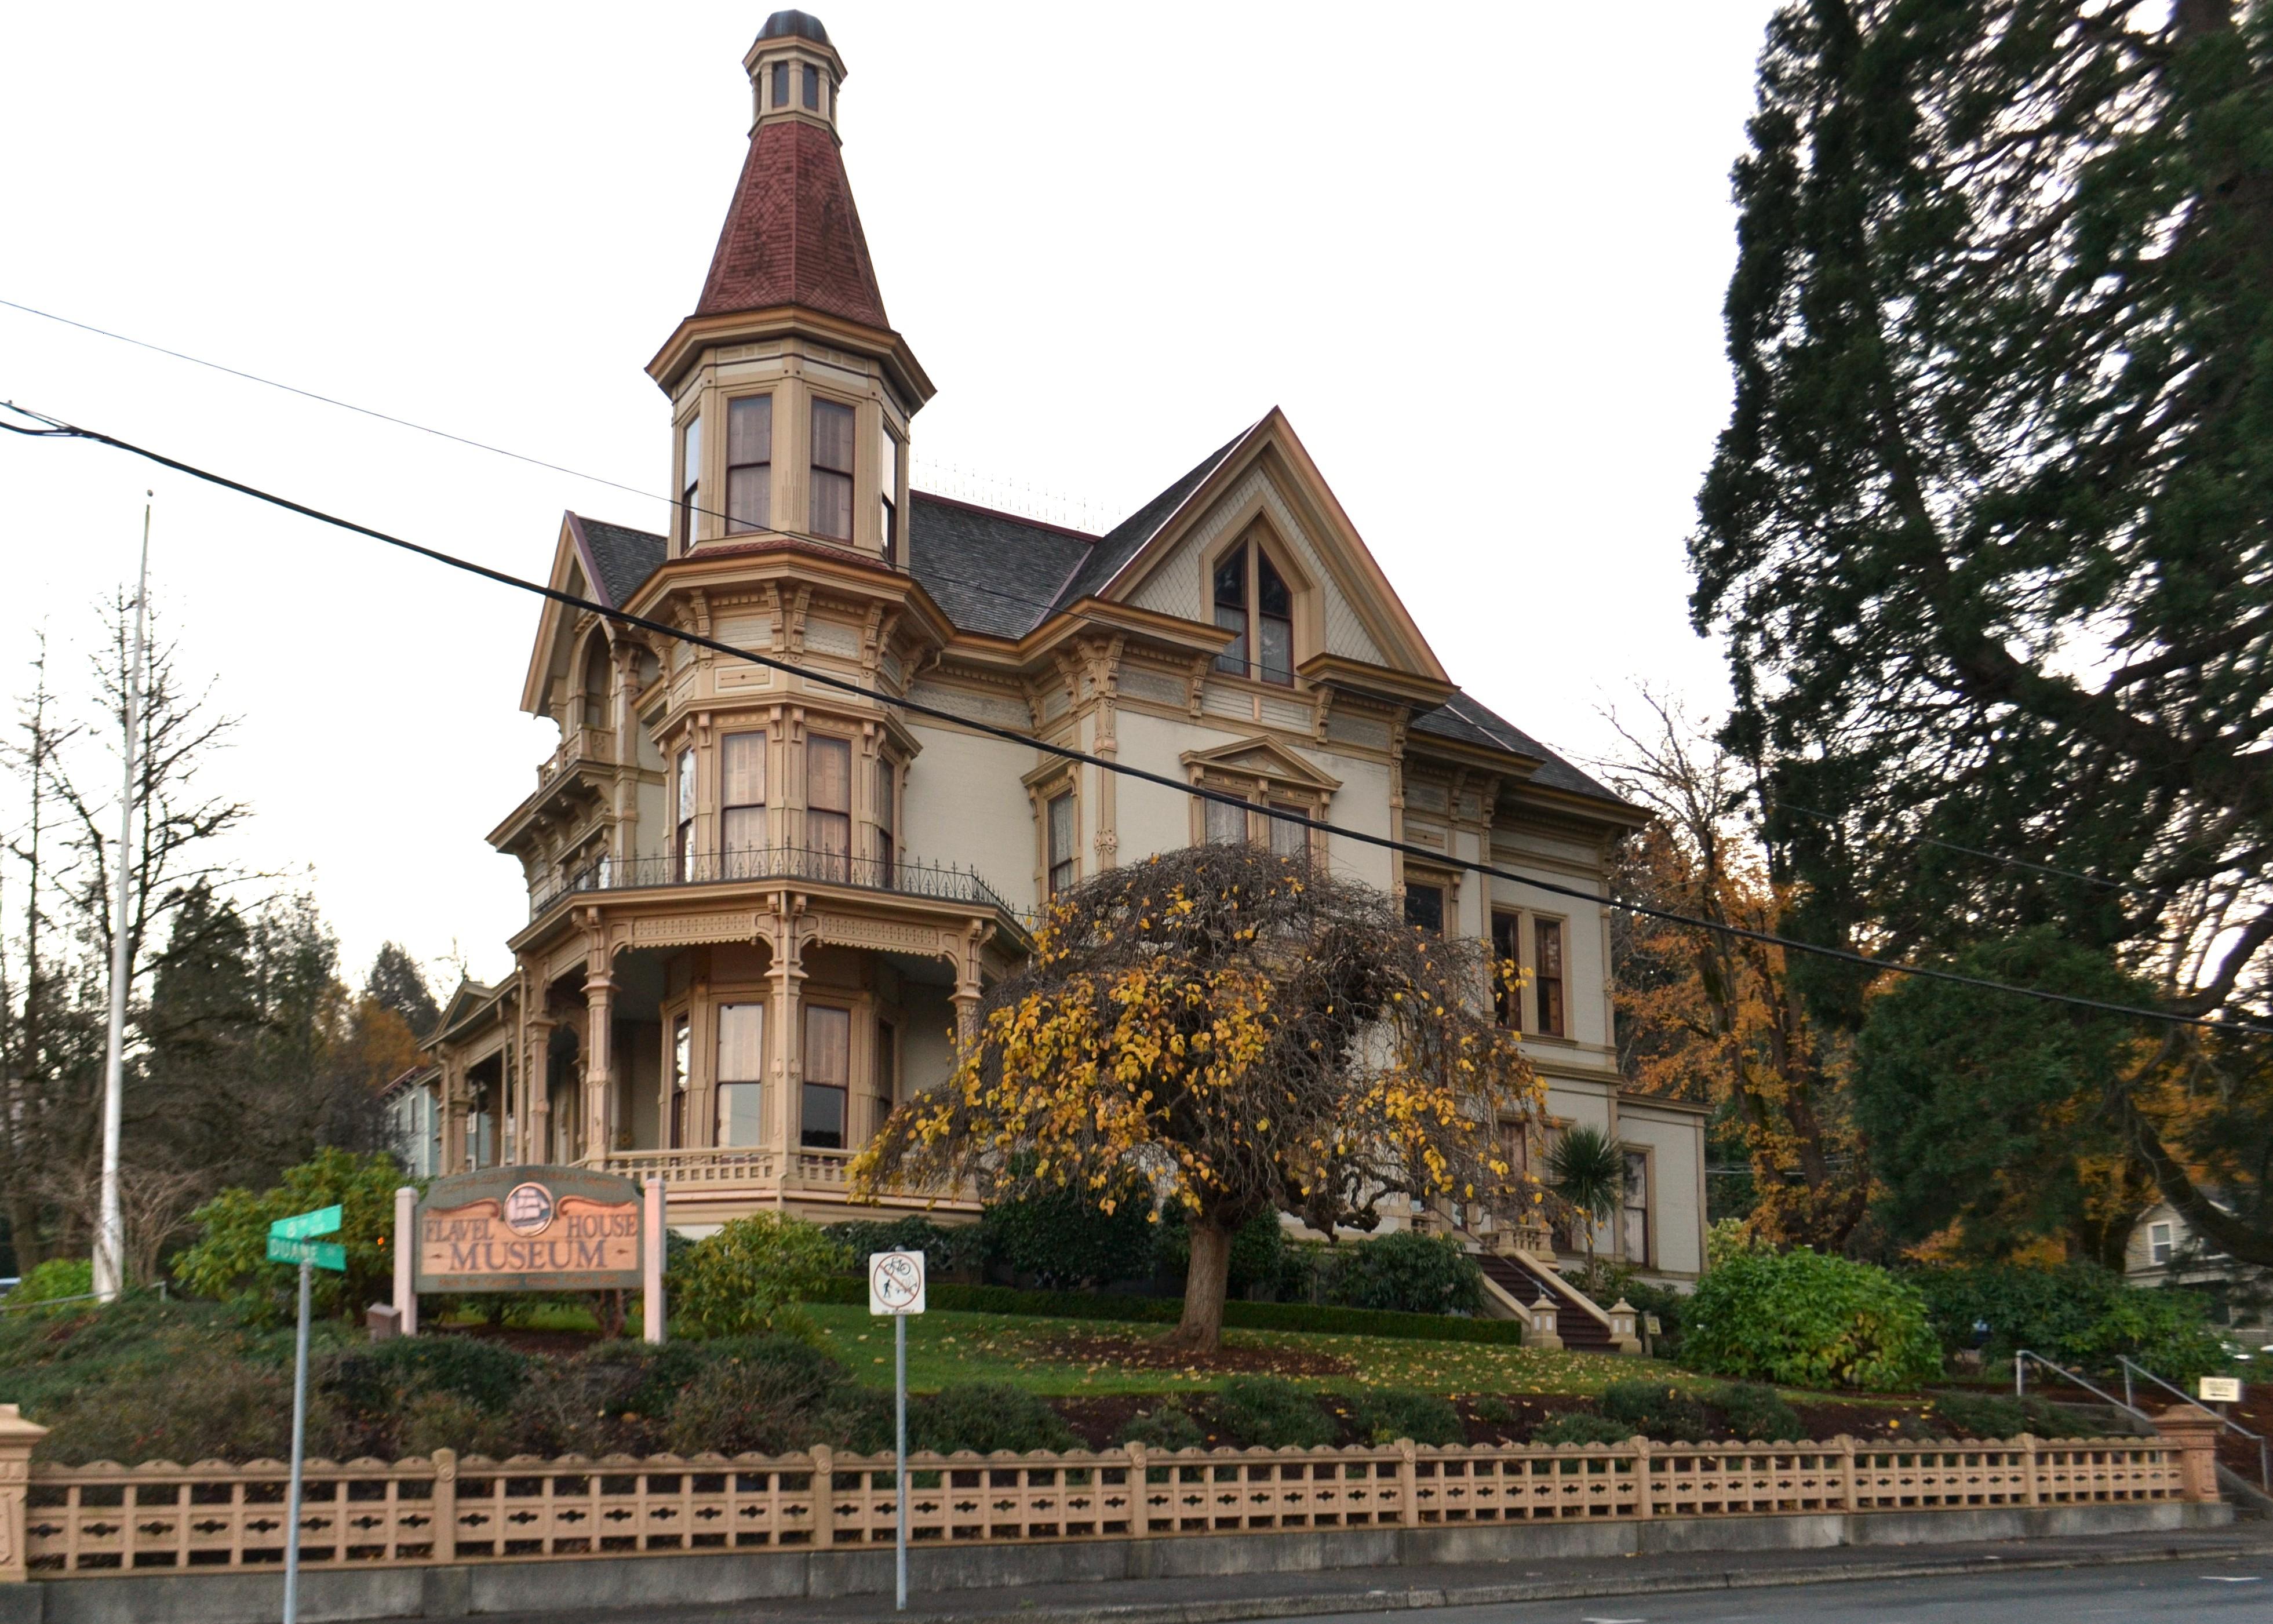 File:Flavel House (Astoria, Oregon).jpg - Wikimedia Commons